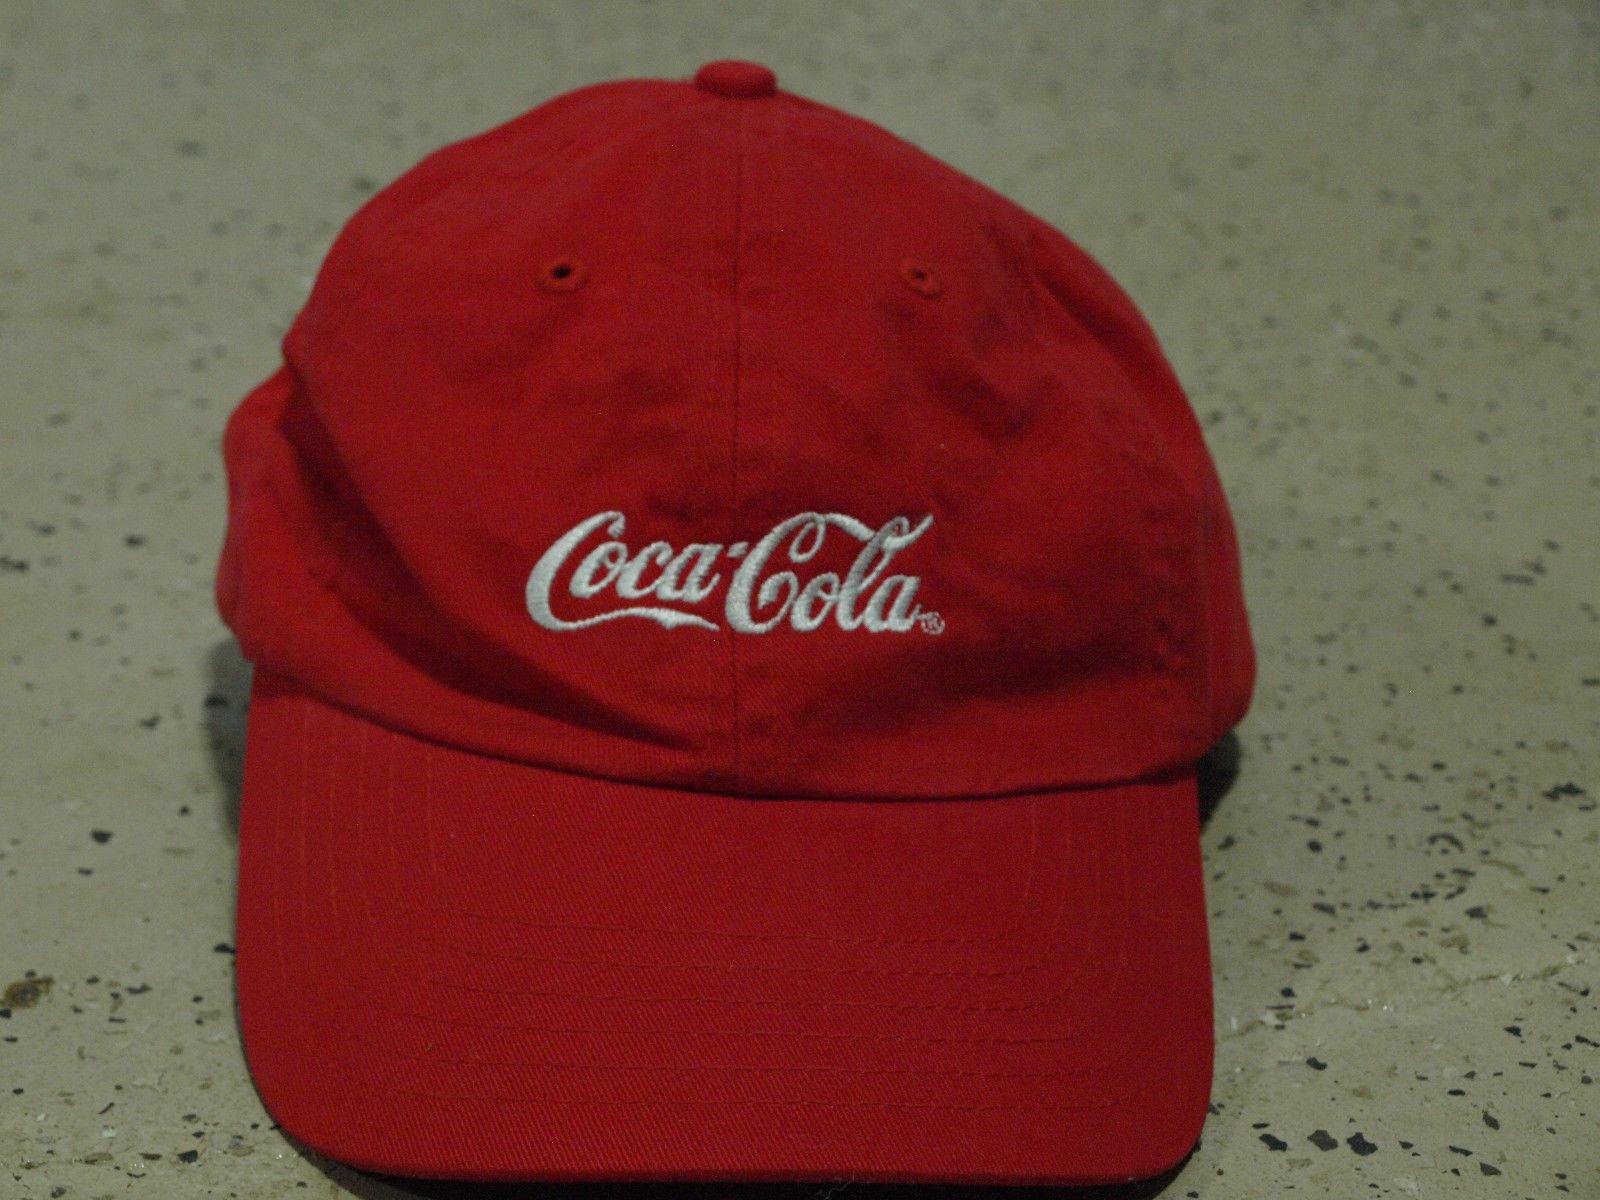 2413f65c3e8 Vintage Coca Cola Red Baseball Cap Hat Quake and 50 similar items. 57